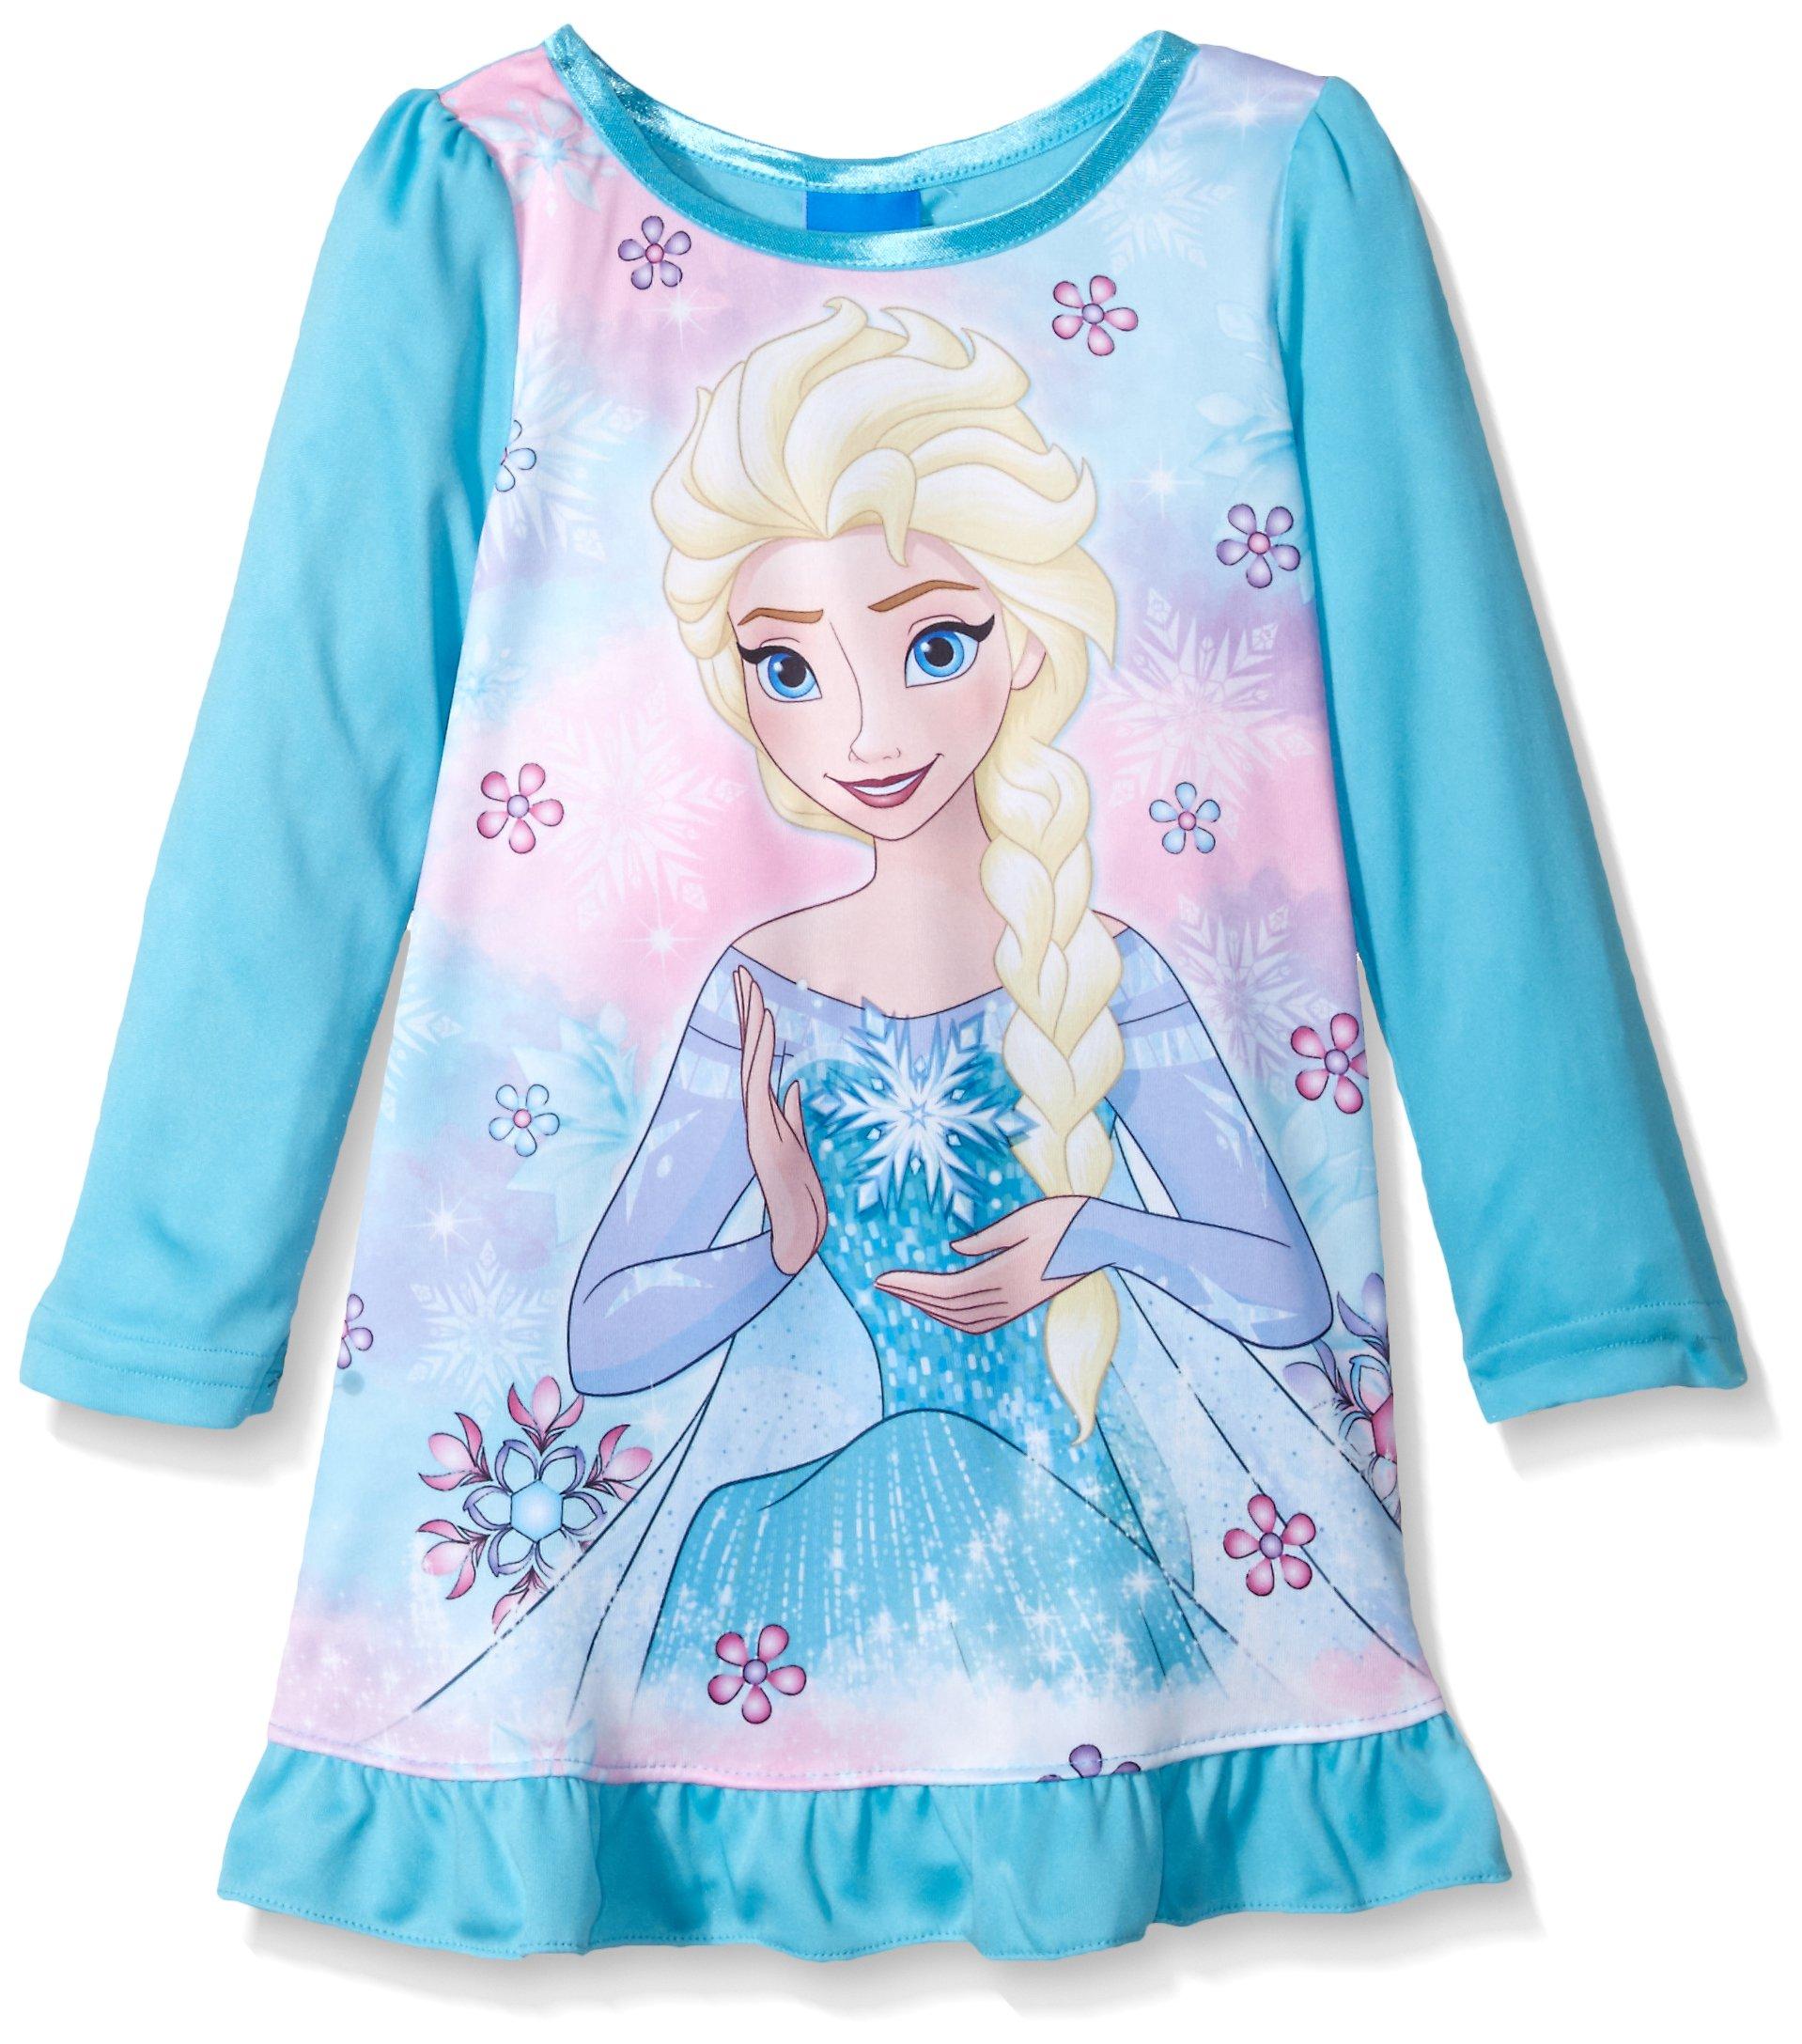 Disney Toddler Girls\' Frozen Elsa Nightgown, Frozen Blue, 2T ...